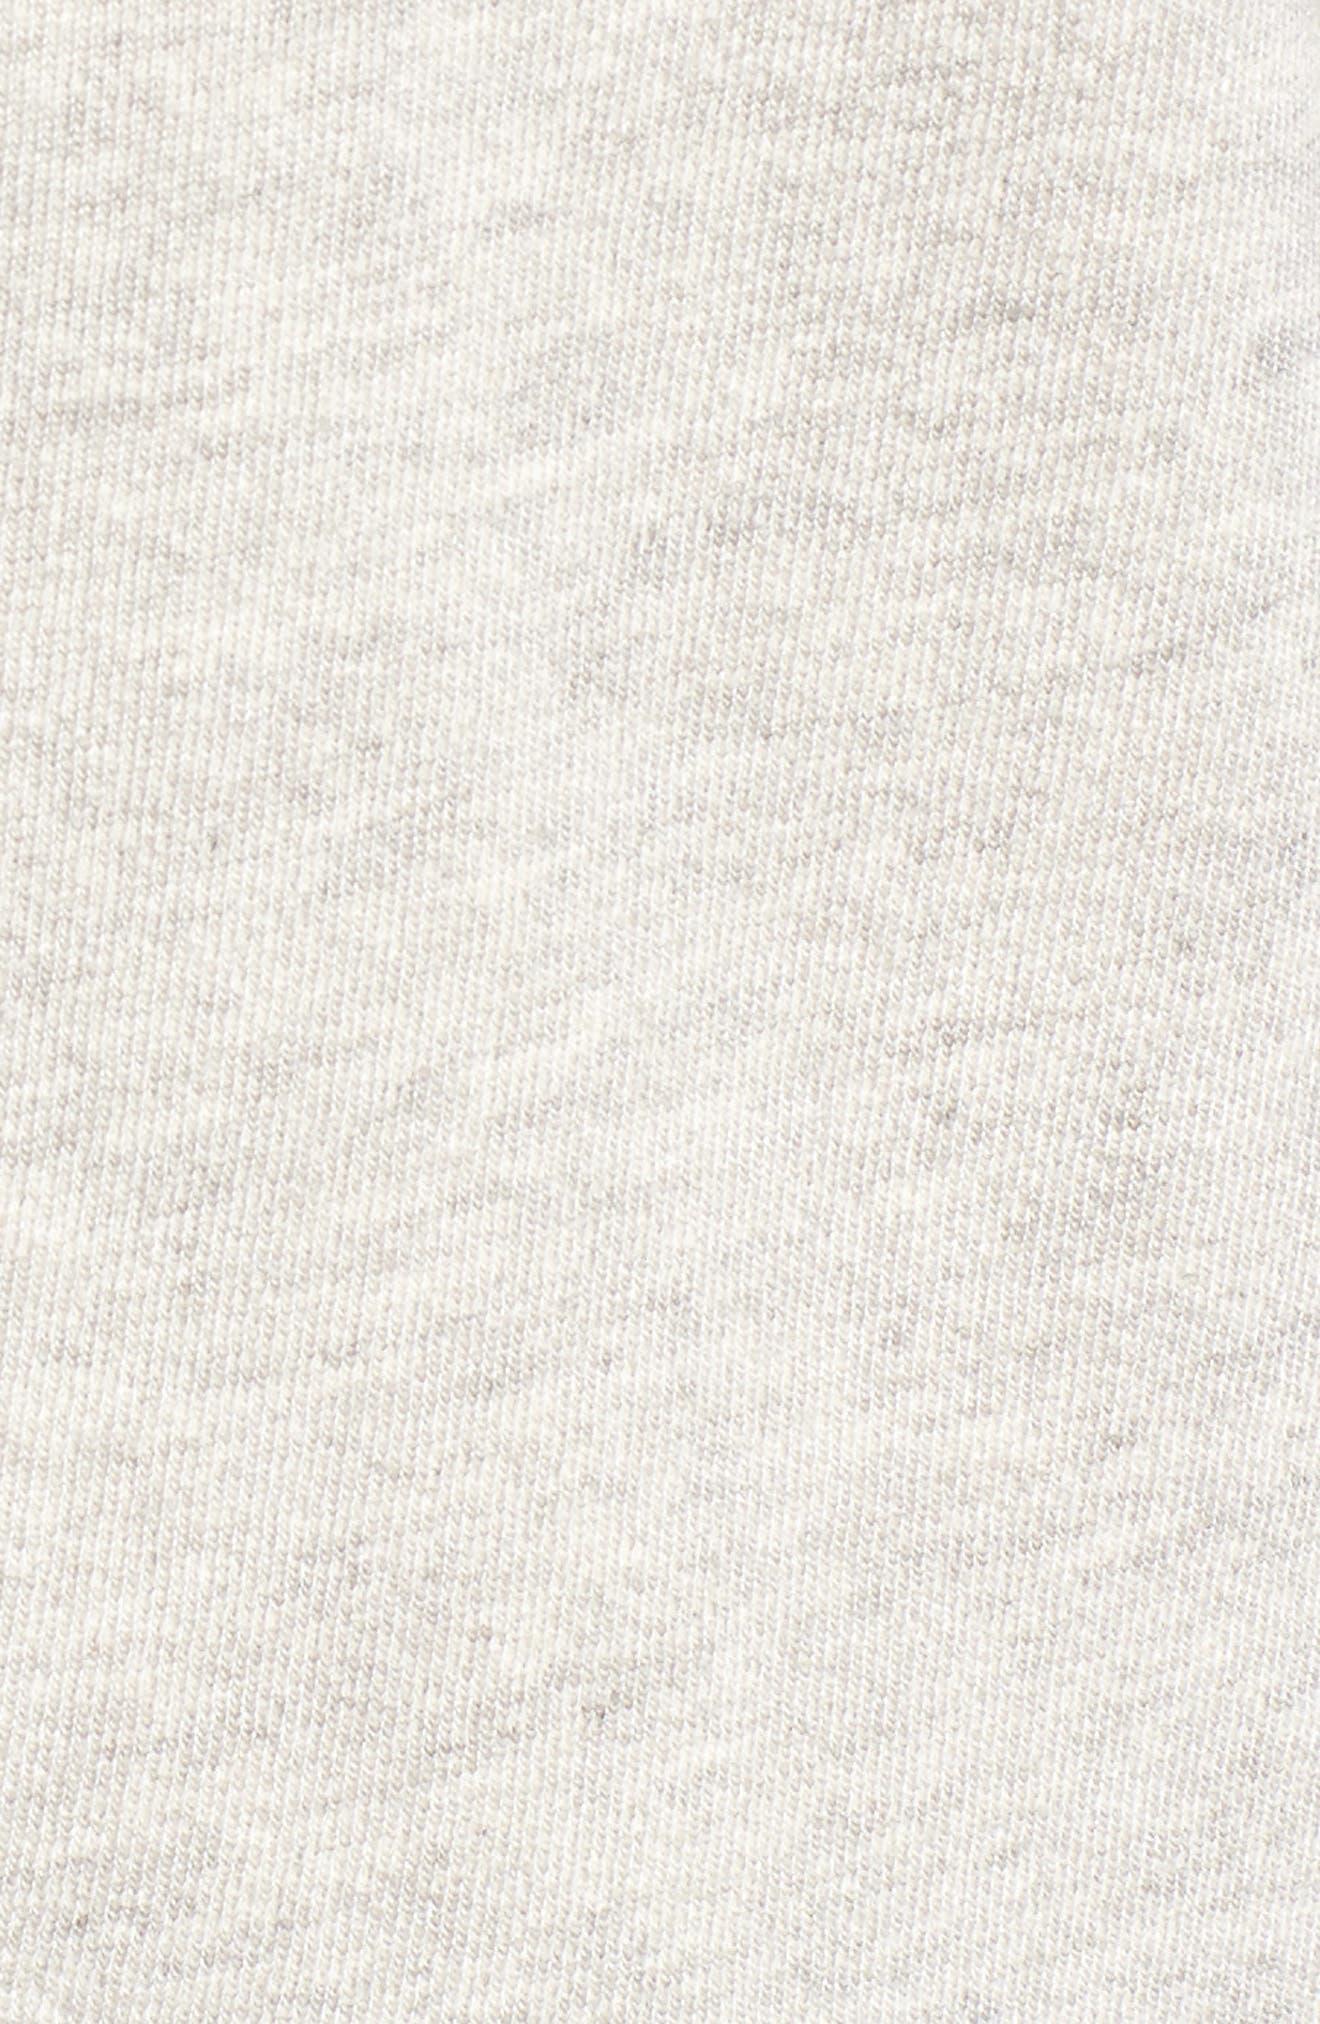 Helix Turtleneck Sweatshirt,                             Alternate thumbnail 5, color,                             030